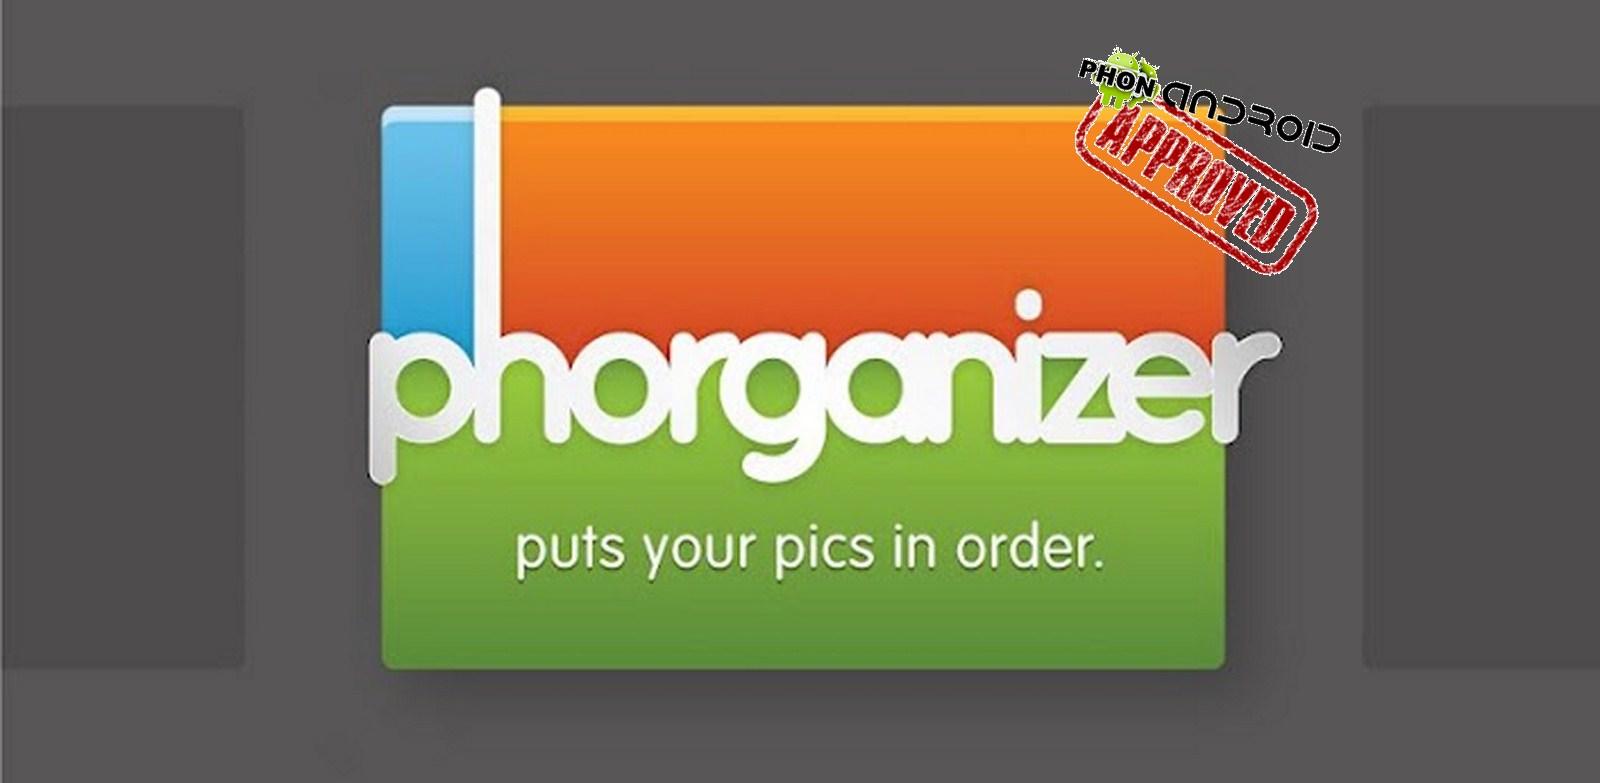 Phorganizer logo